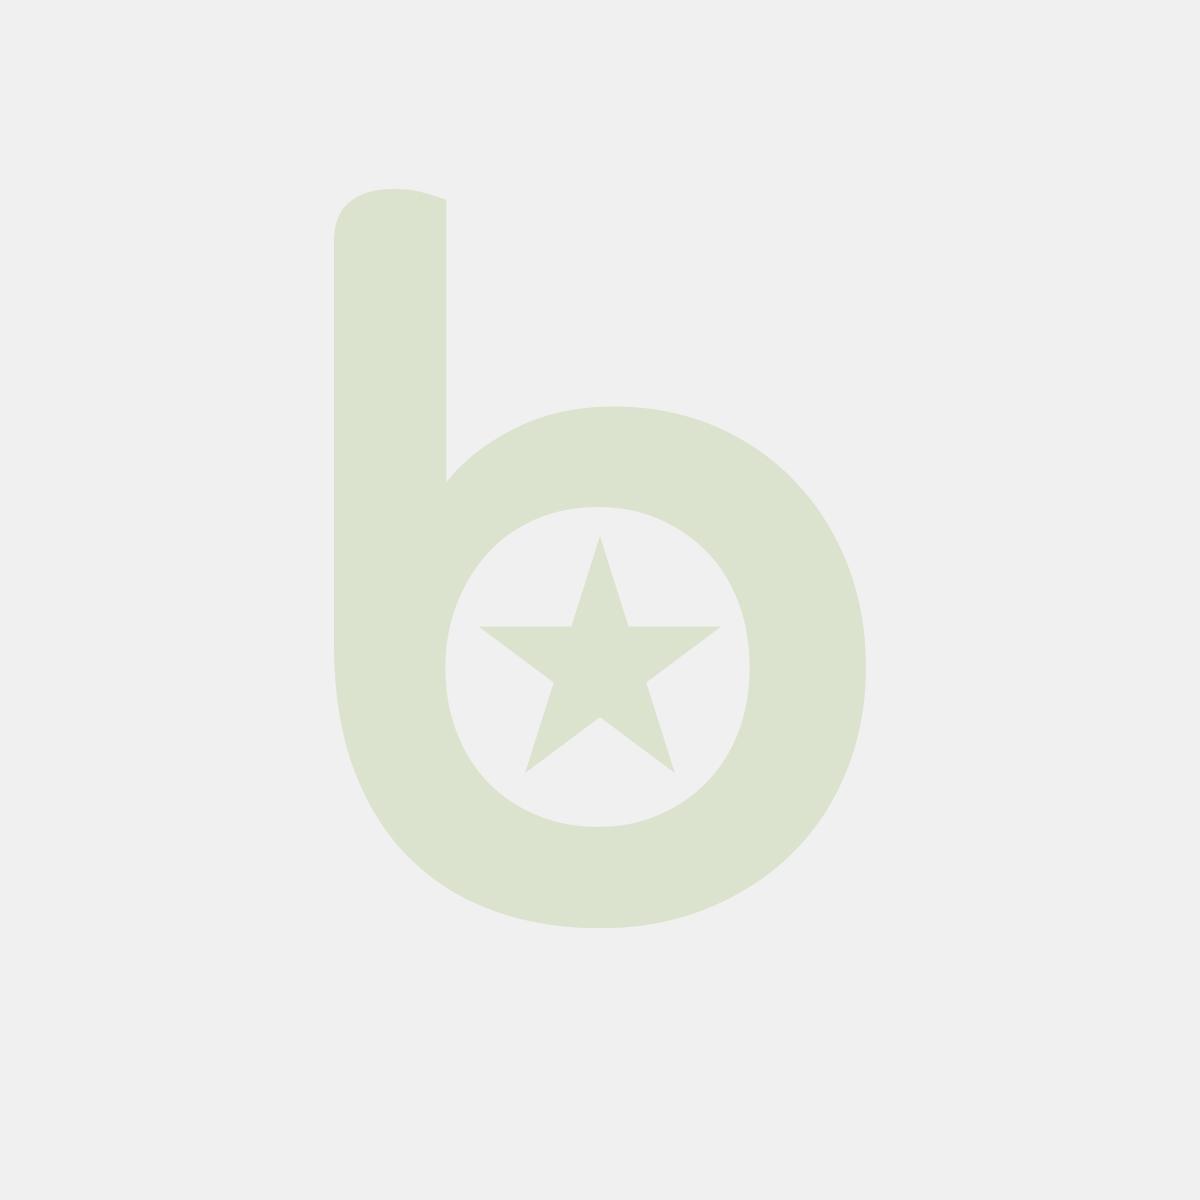 Notatnik SIGEL Conceptum® okładka filc, A6, gładki, różowy